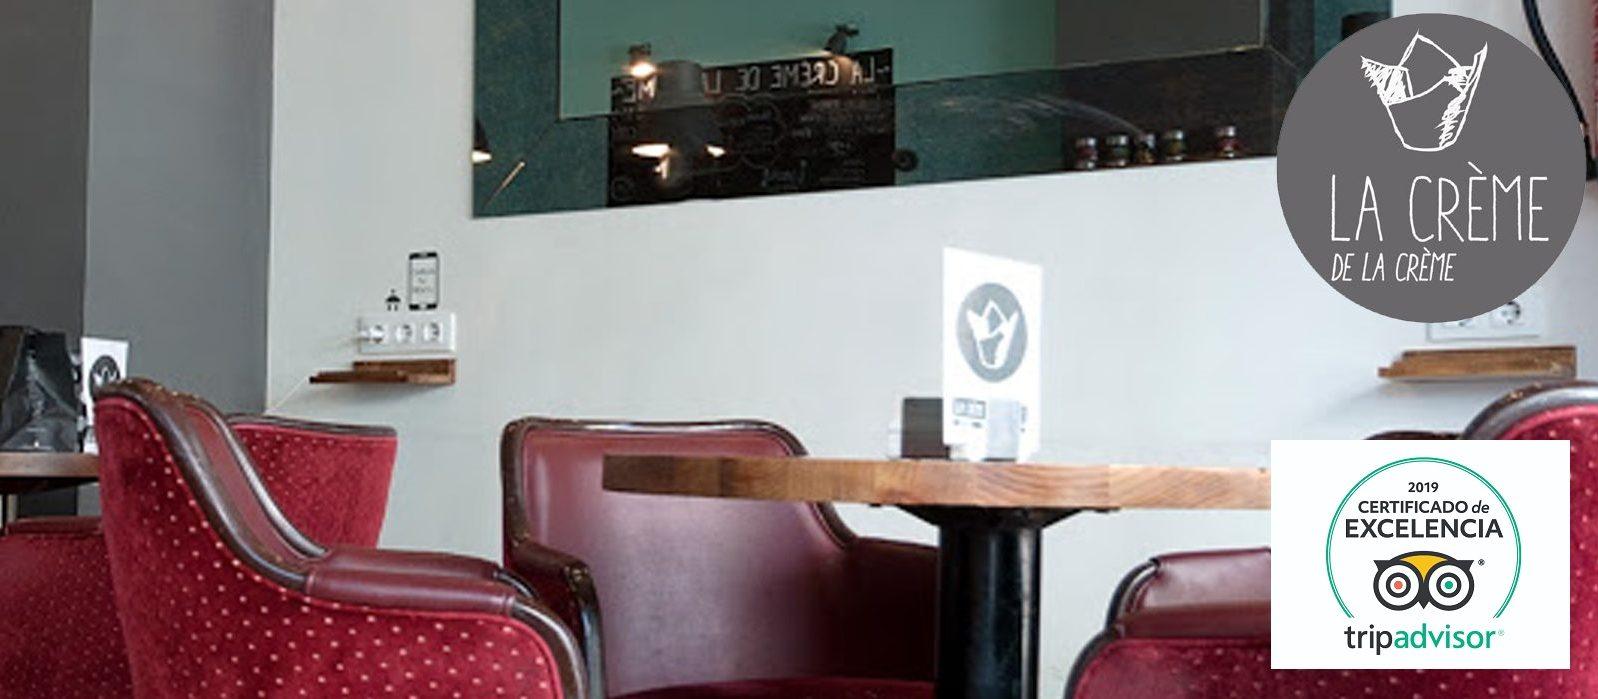 cafeterias-en-sevilla-cafeterias-con-encanto-en-sevilla certificado excelencia tripadvisor sevilla